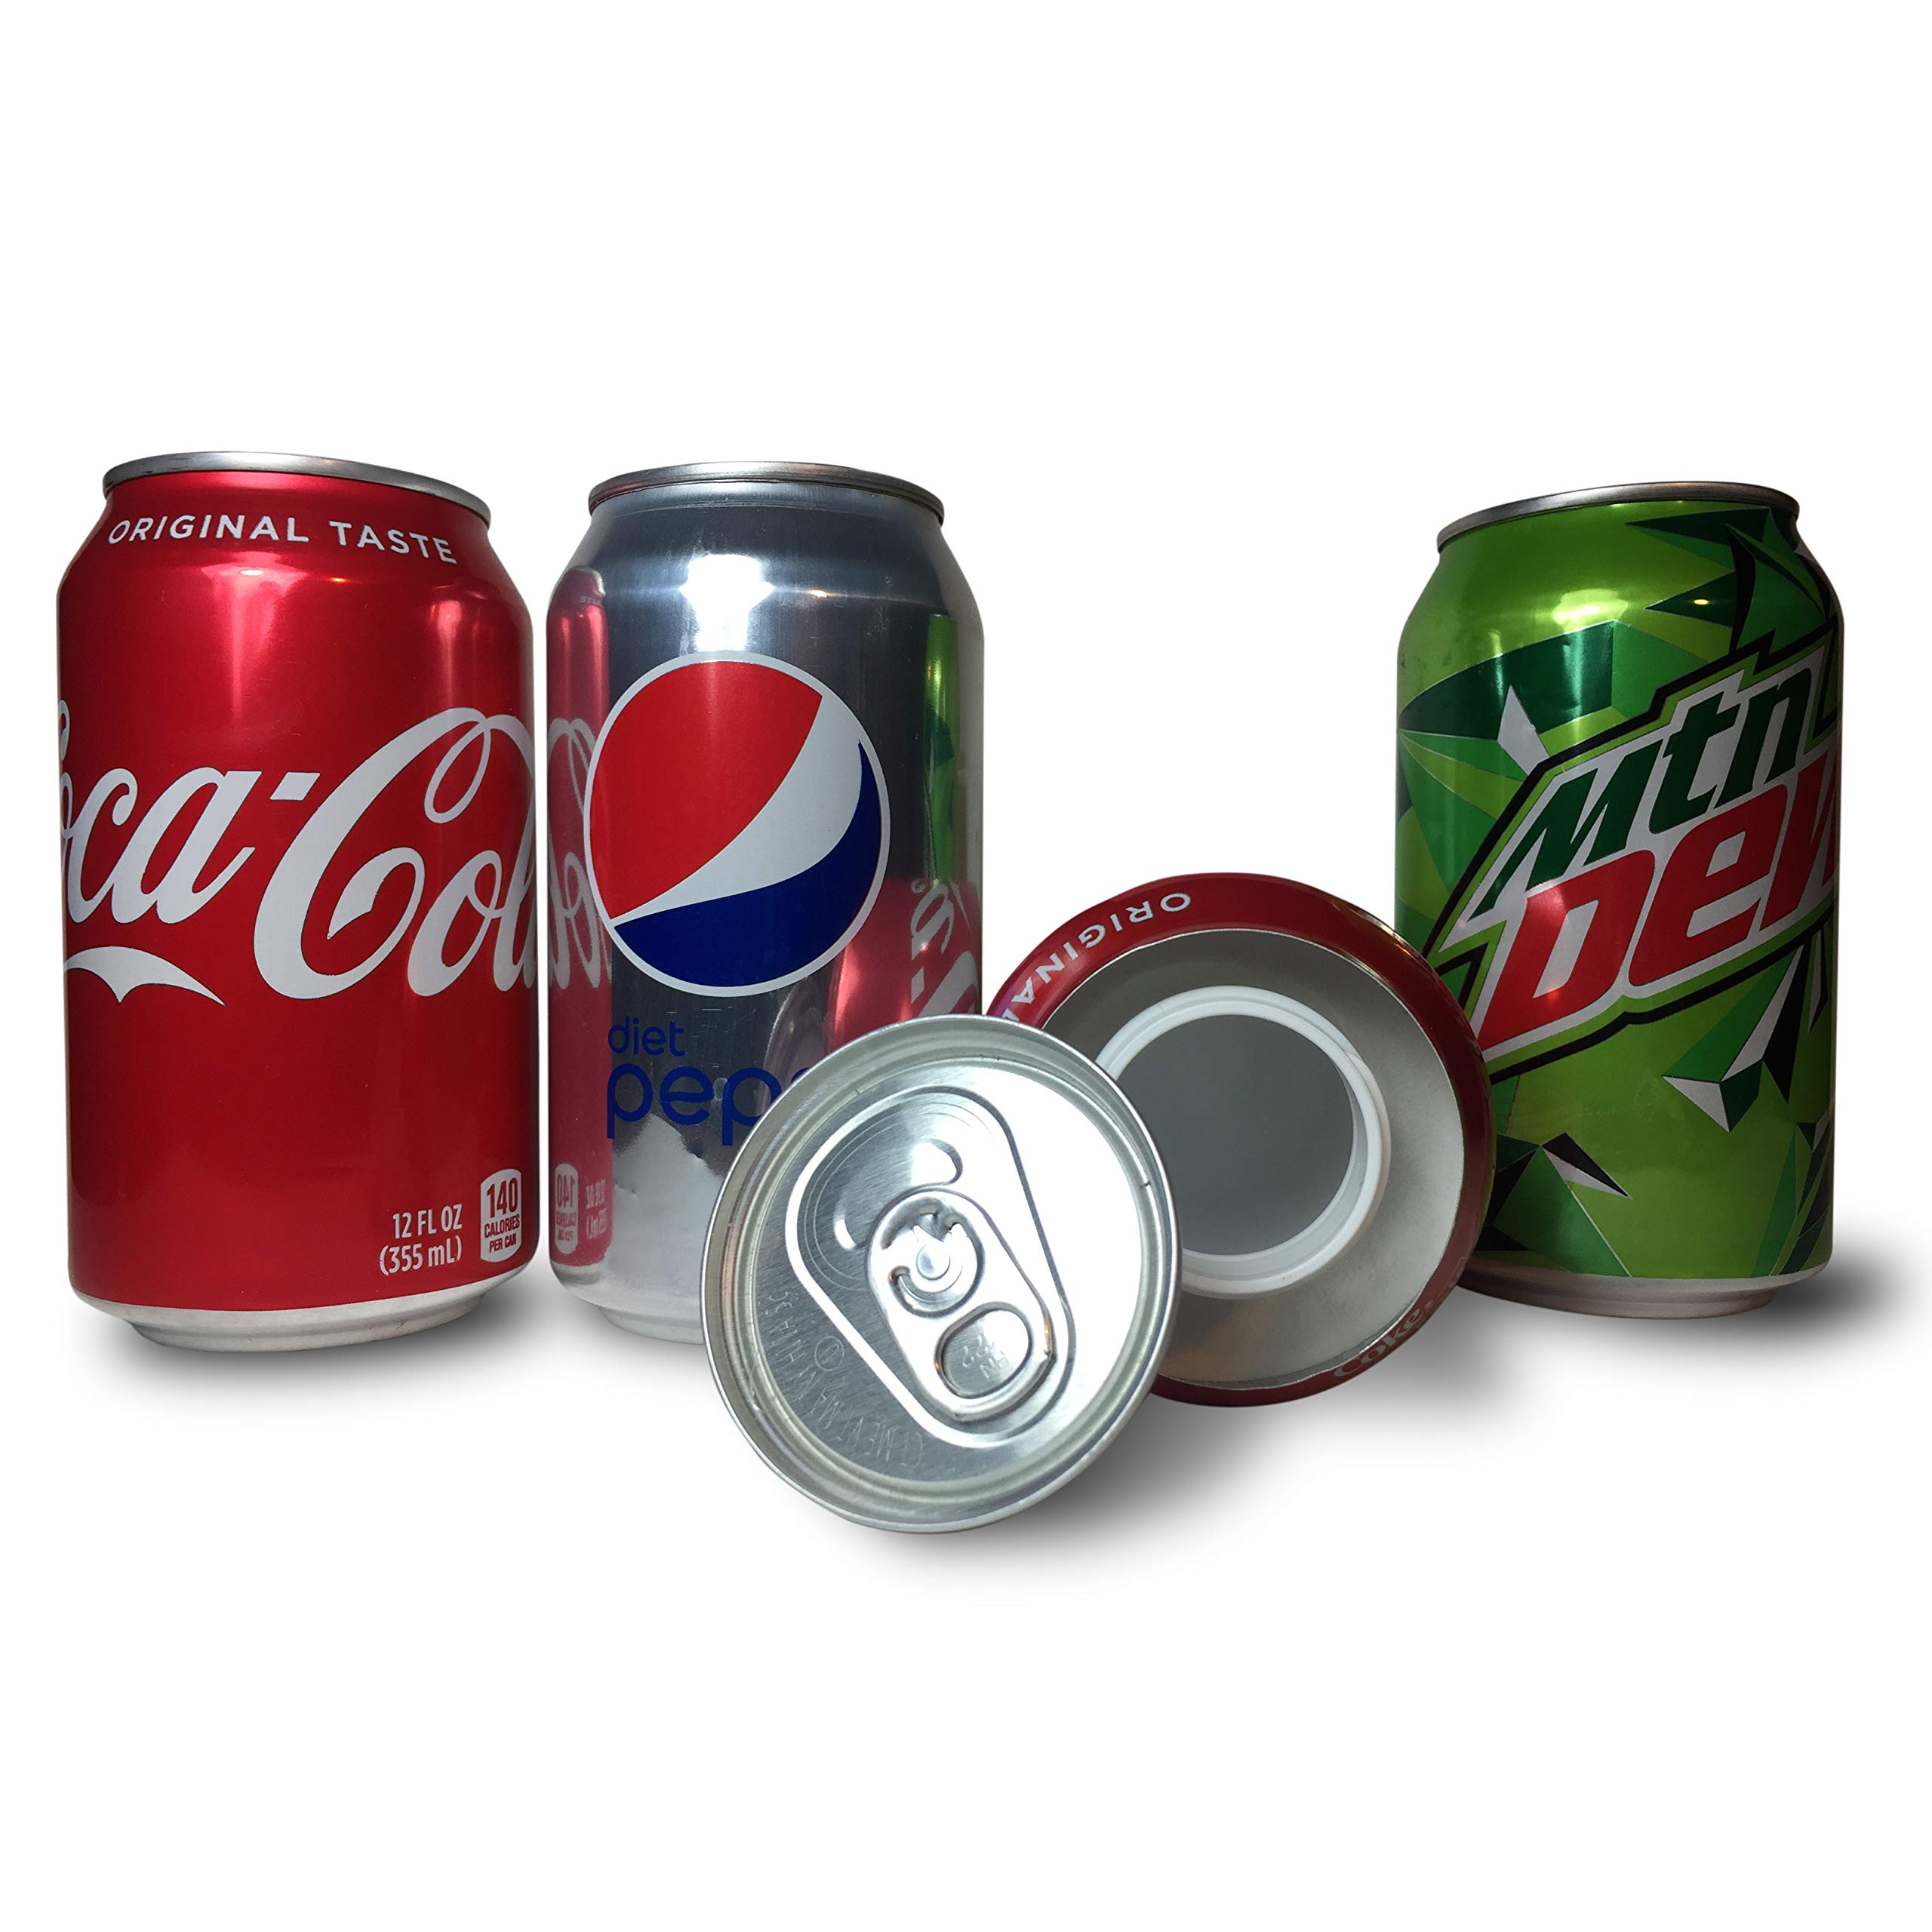 3 Secret Safe Diversion Soda Stash Safes Coke Diet Pepsi MNT Dew to Hide Money Jewelry Anything